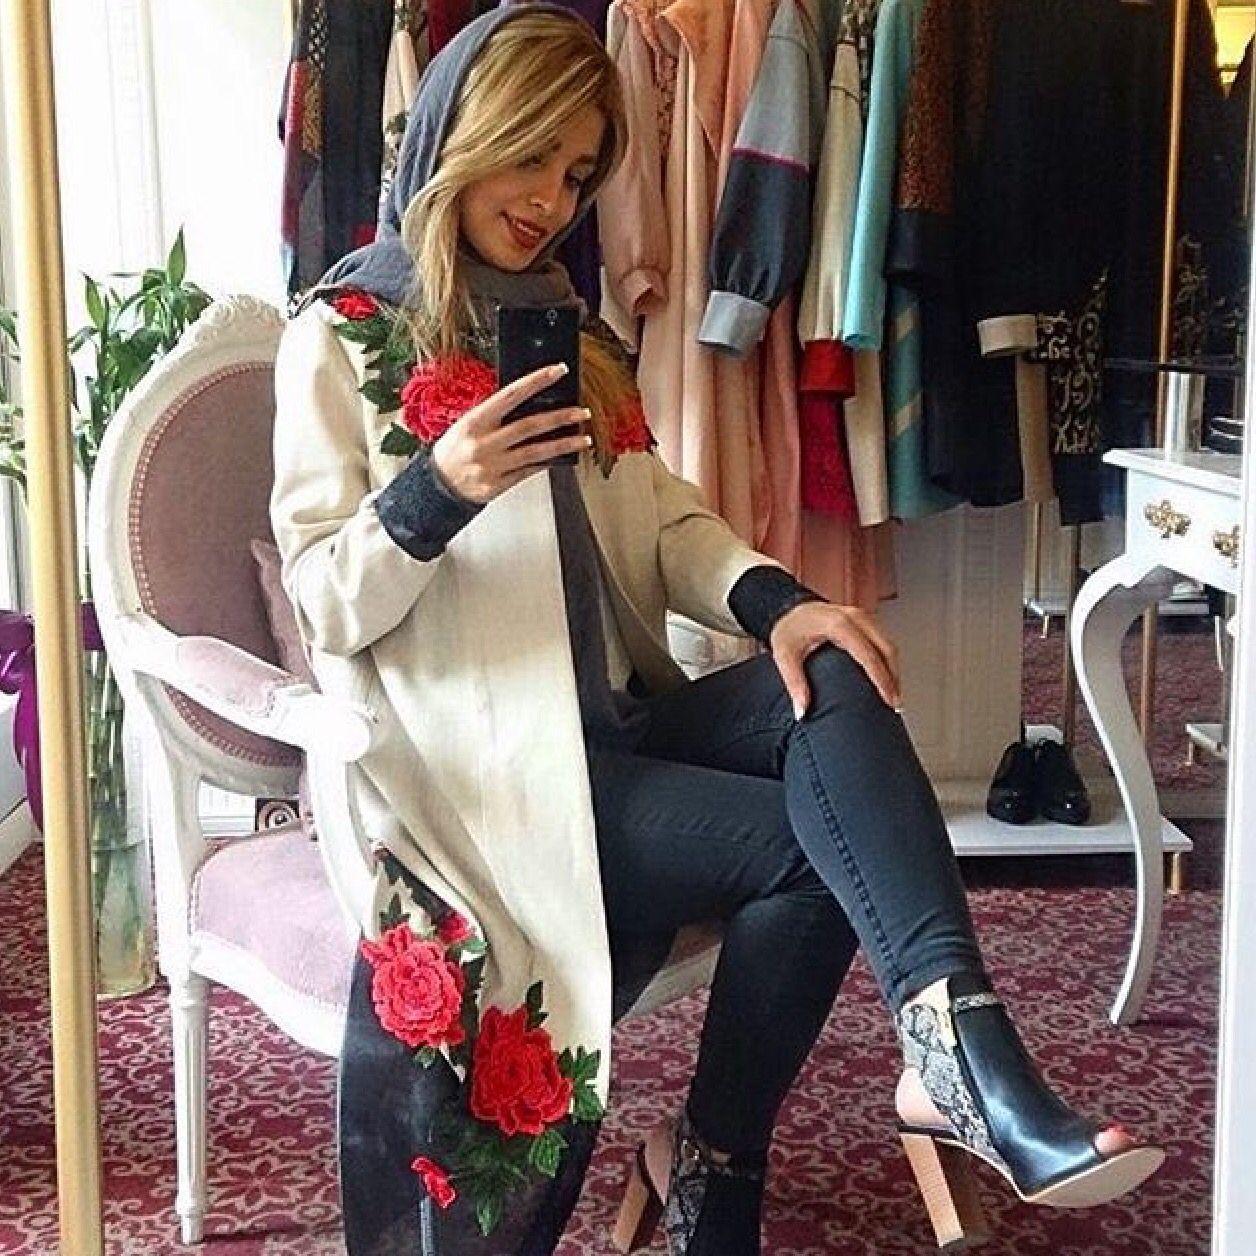 Flor Collectiom  Pre-sprimg Collection 2016  By Nazanin Karimi #nk #nazaninkarimi #fashion #designer #tehran #street #style #irstreetstyle #iran